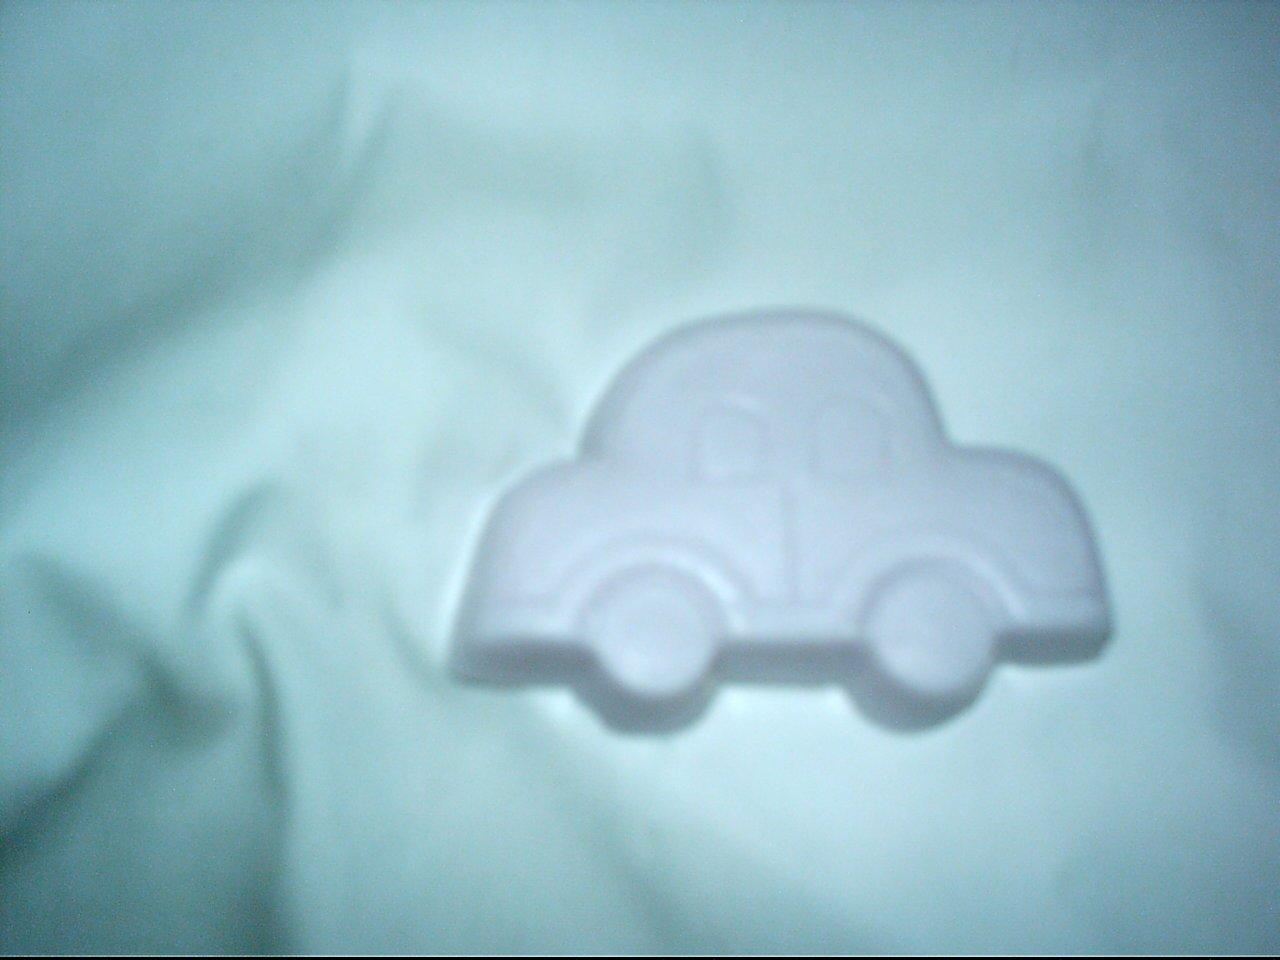 Car Shaped Soap